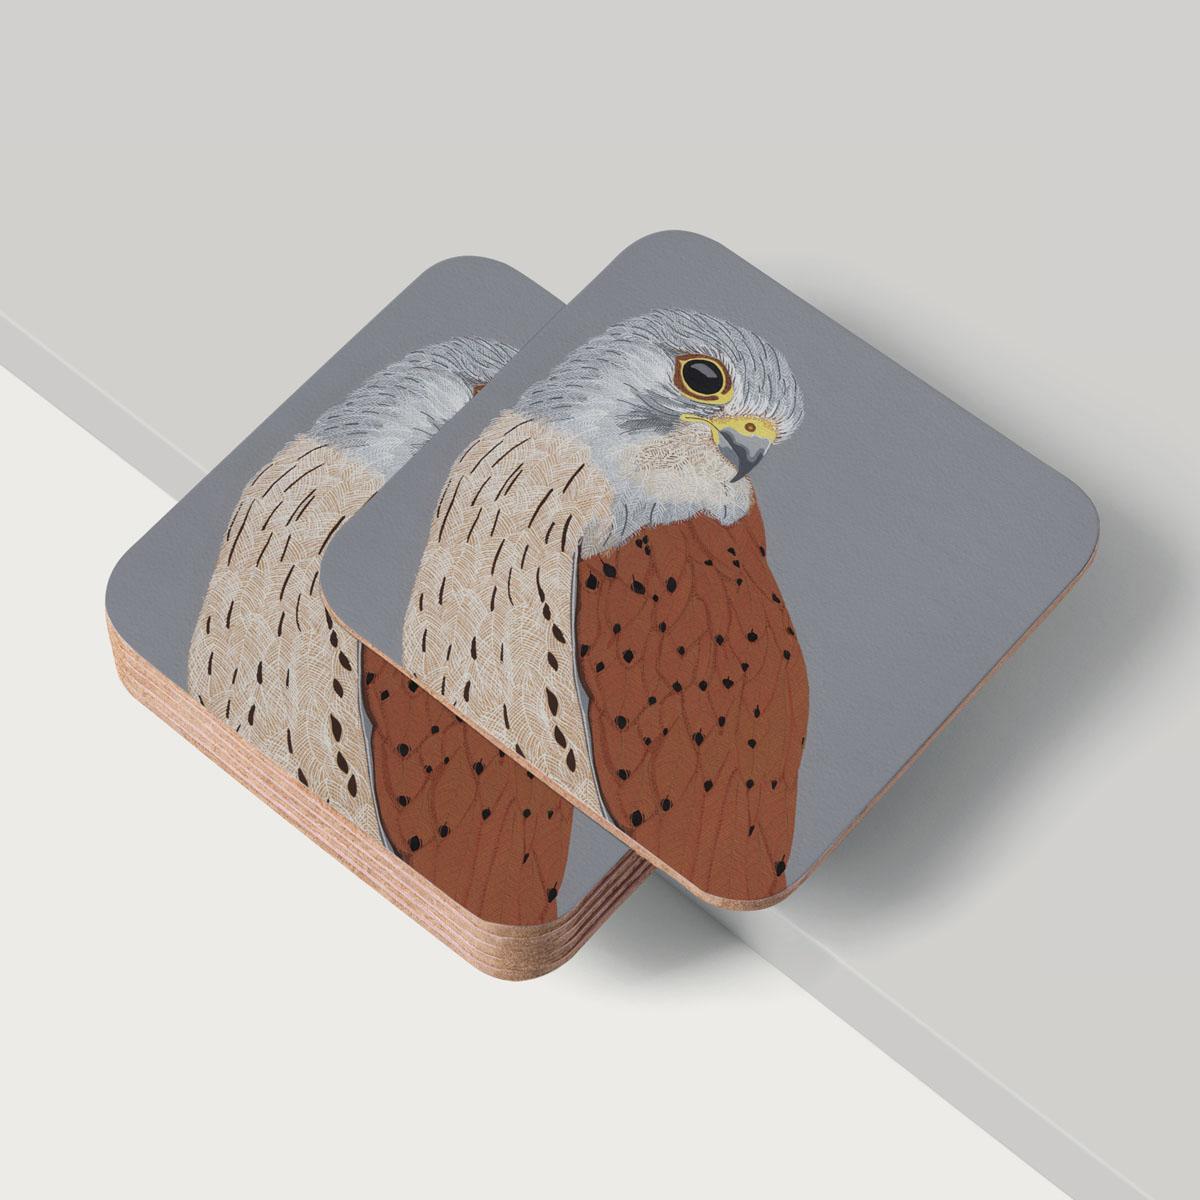 Kestrel Placemat Coaster Homewares